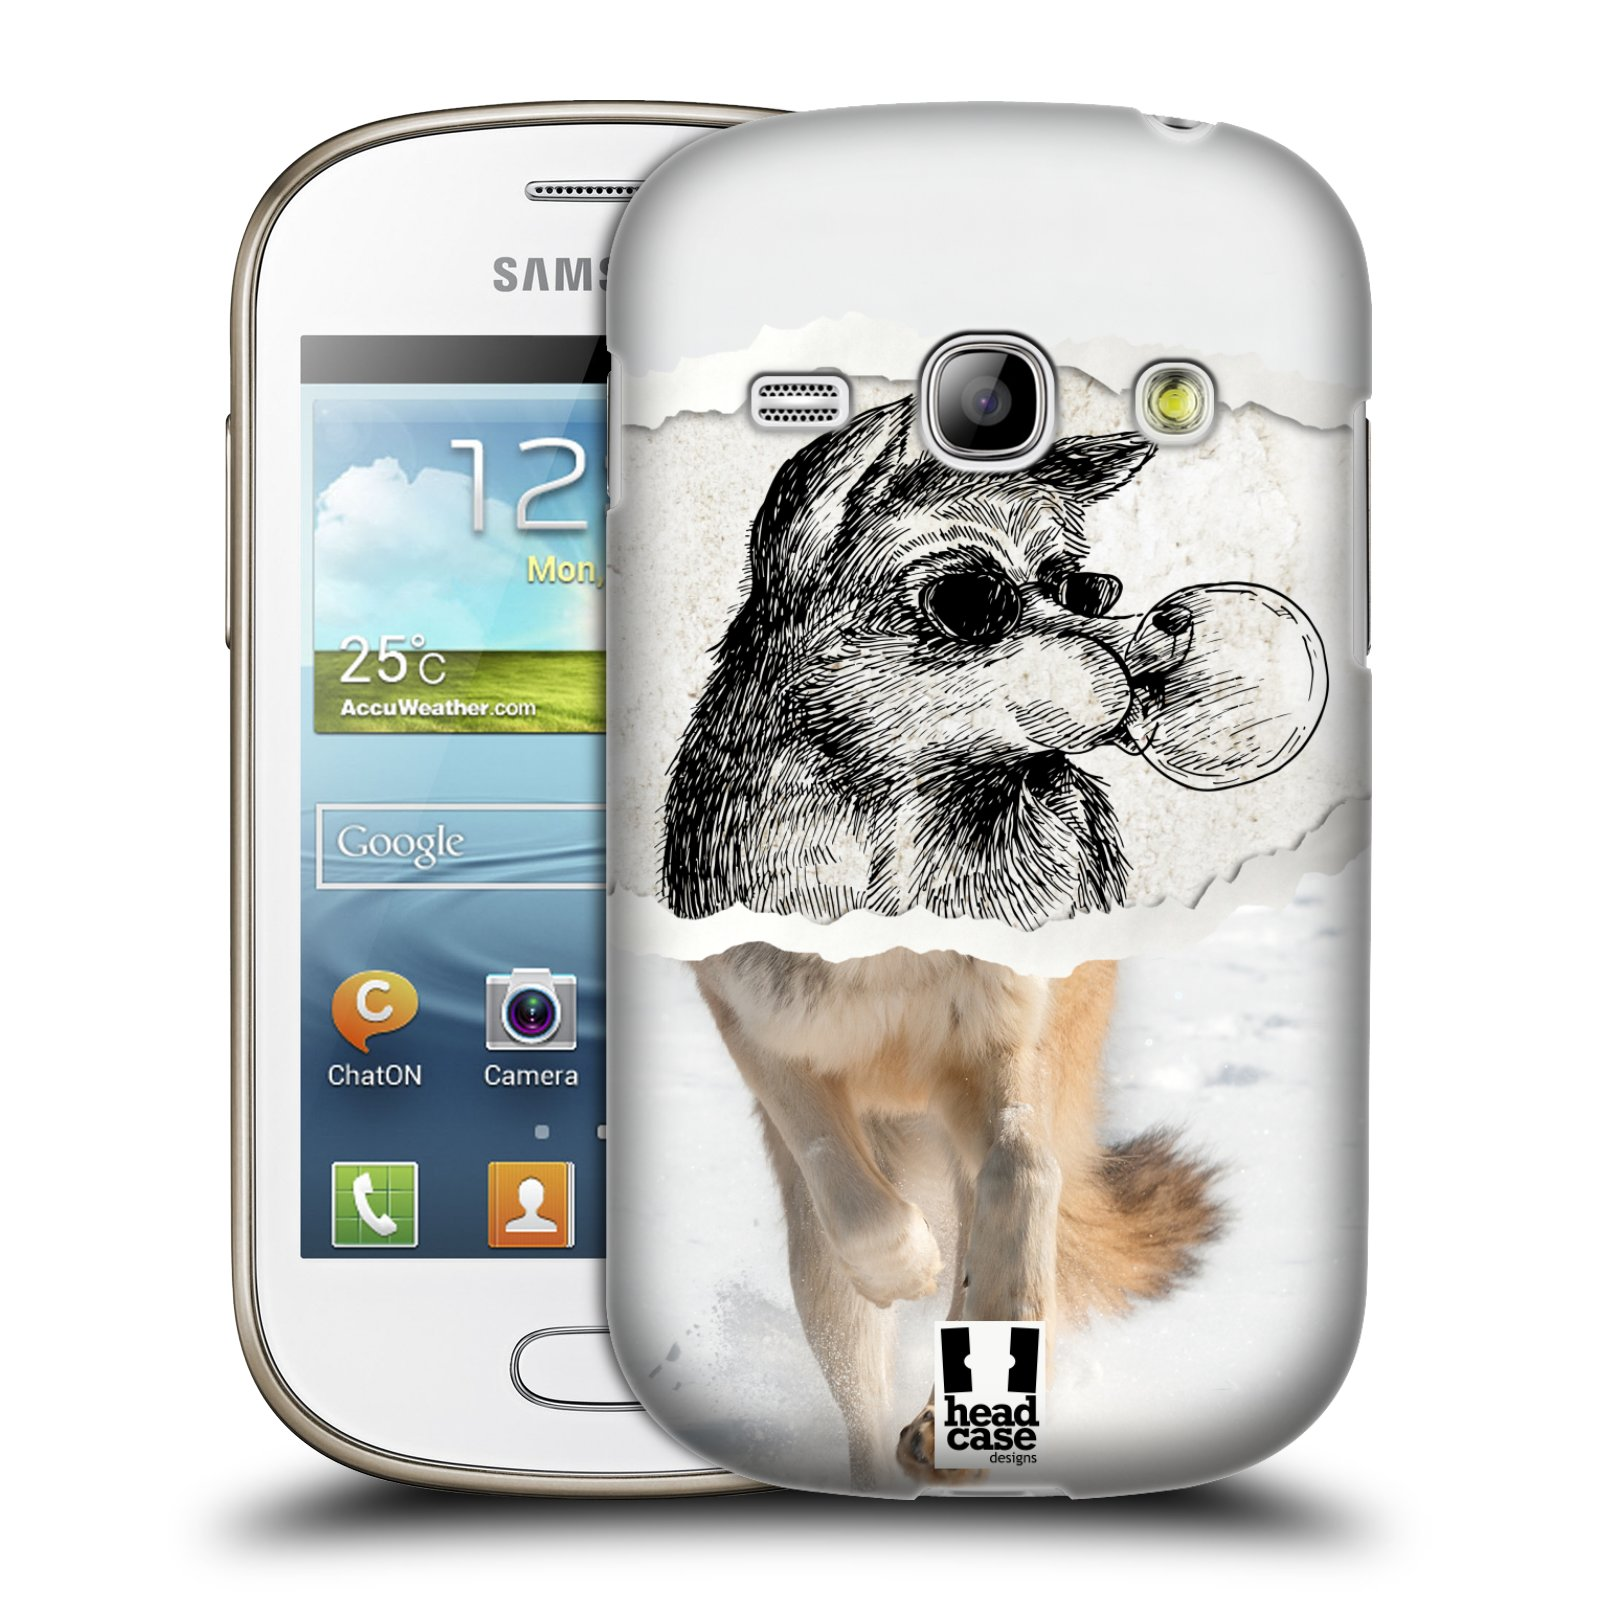 HEAD CASE plastový obal na mobil SAMSUNG GALAXY FAME (S6810) vzor zvířata koláž vlk pohodář